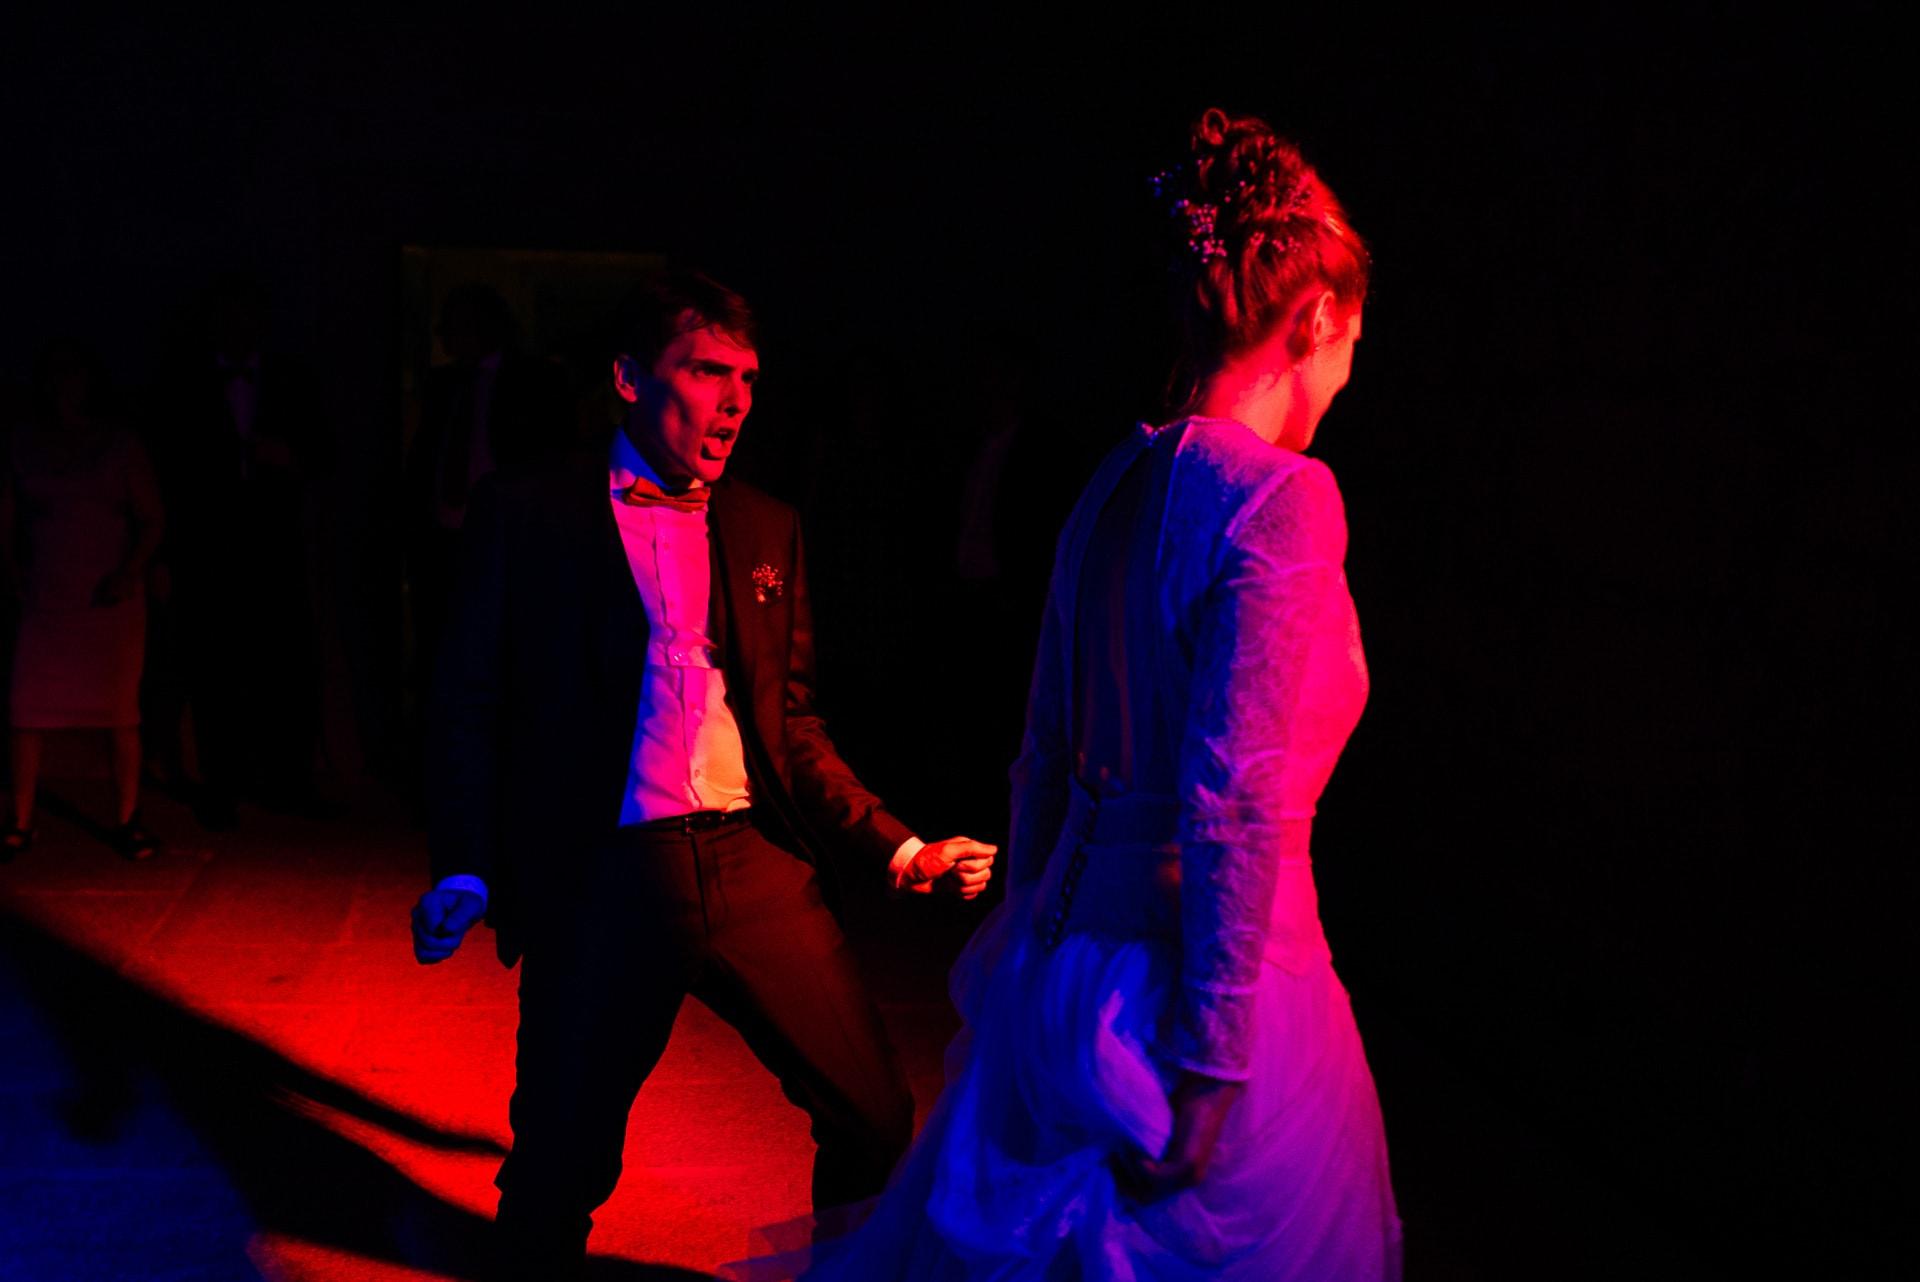 wedding - rachel & David - Photo by Luis Efigenio